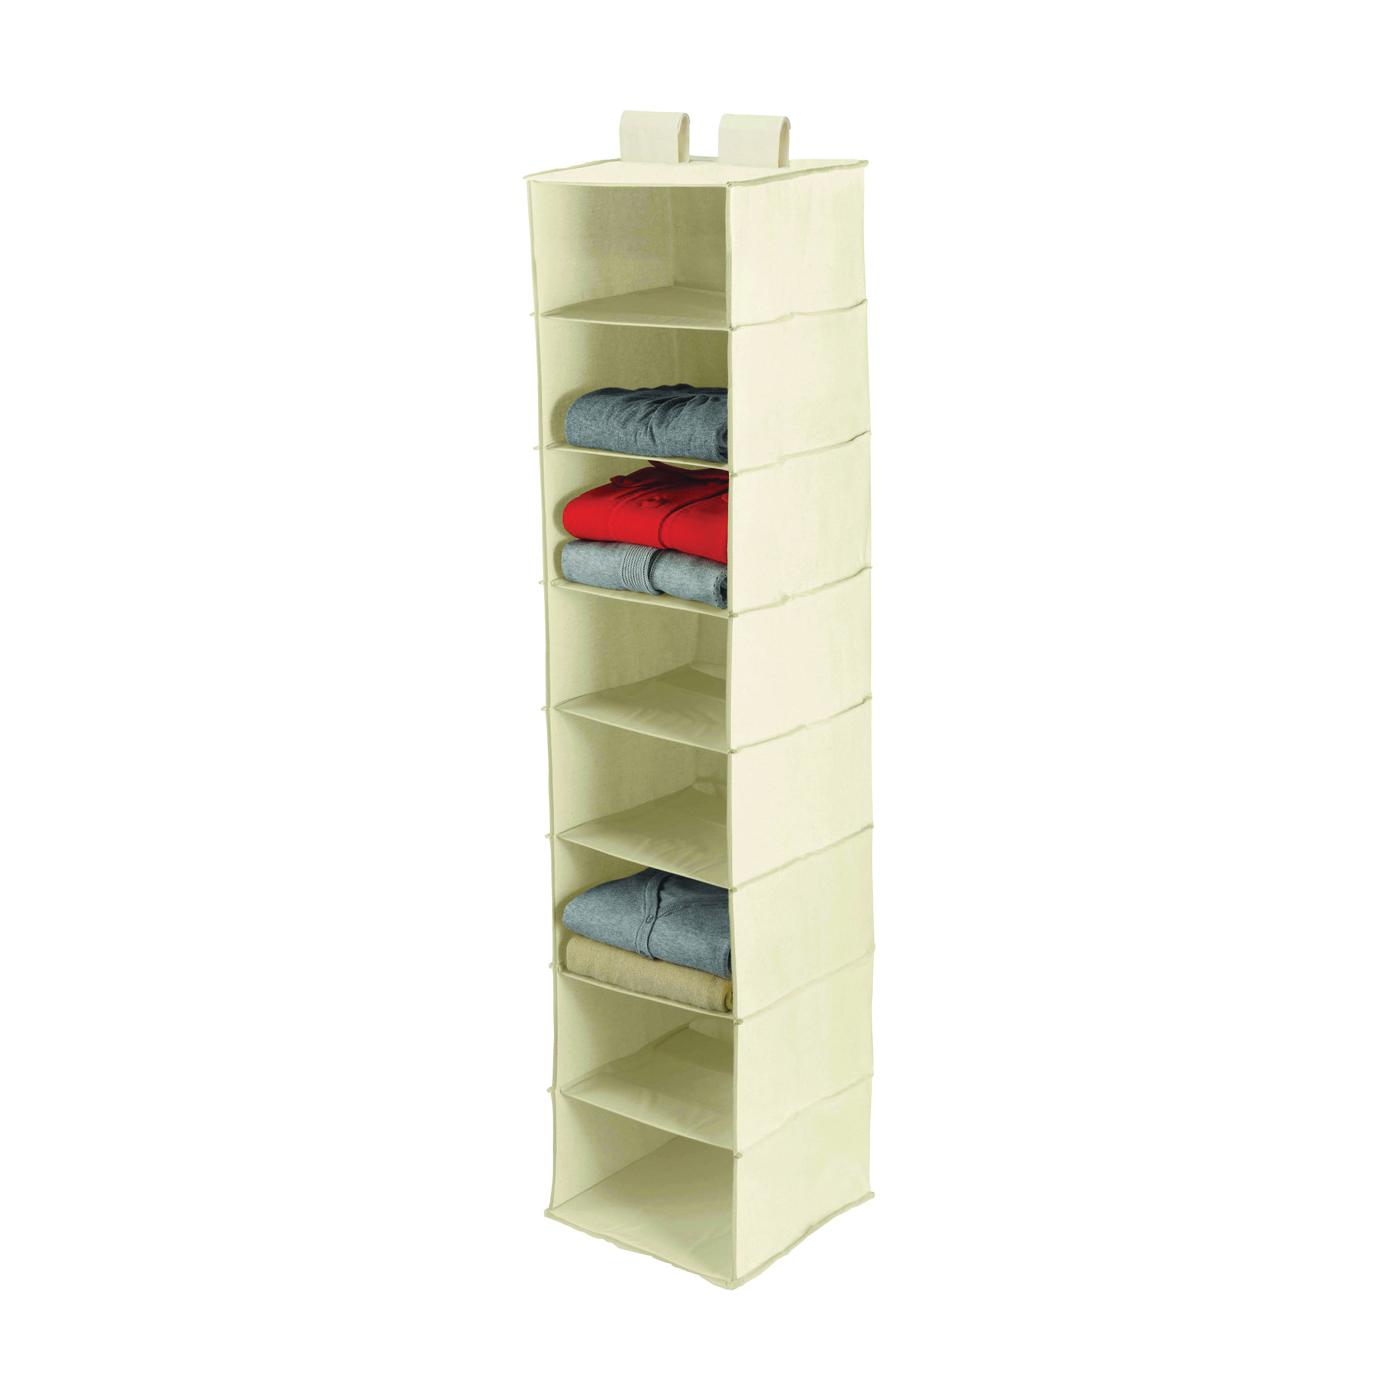 Picture of Honey-Can-Do SFT-01253 Closet Organizer, 12 in W, 54 in H, 8-Shelf, Canvas, Beige